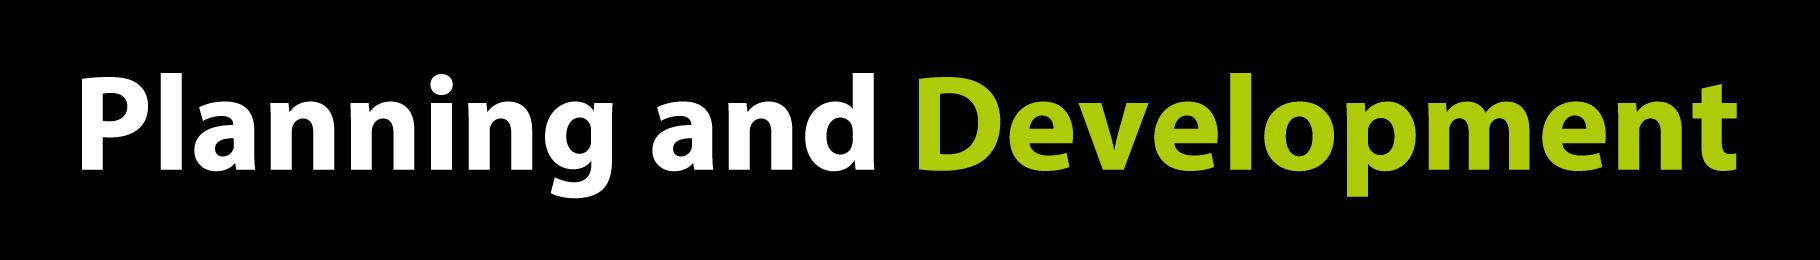 Plannign-and-Devlopment-Title